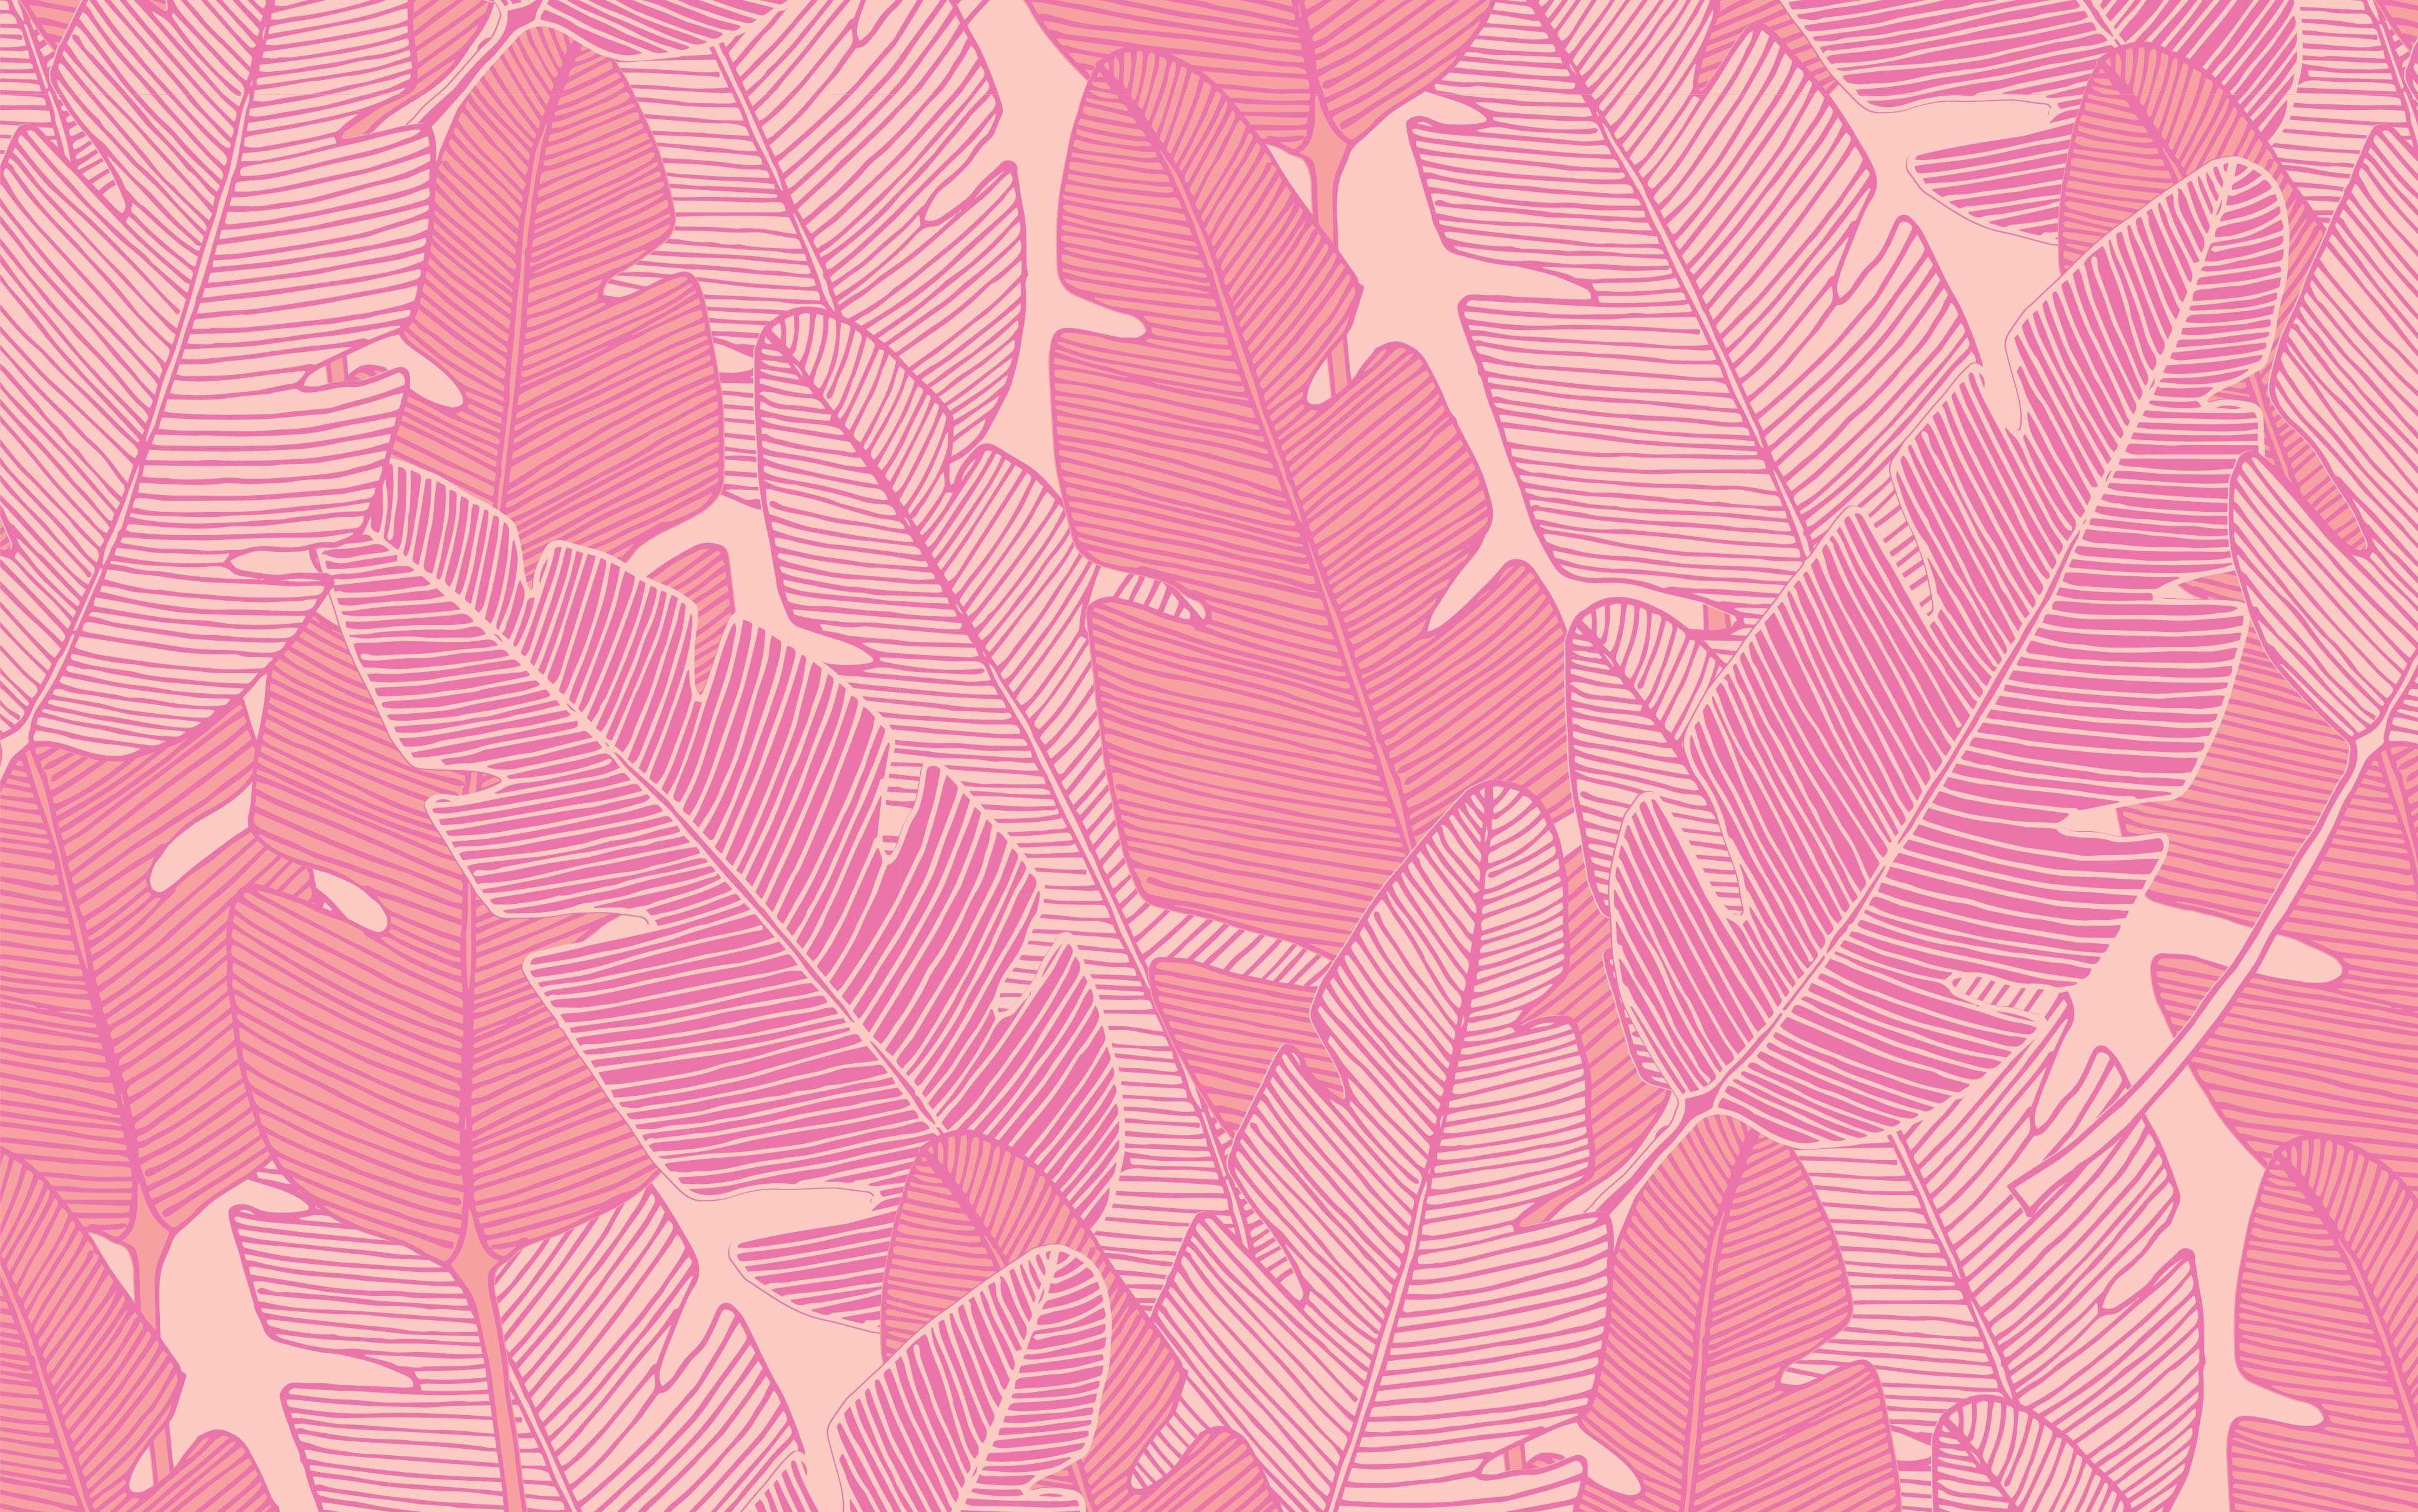 Pin by Yoonie Bangtan on Wallpaper Laptop wallpaper